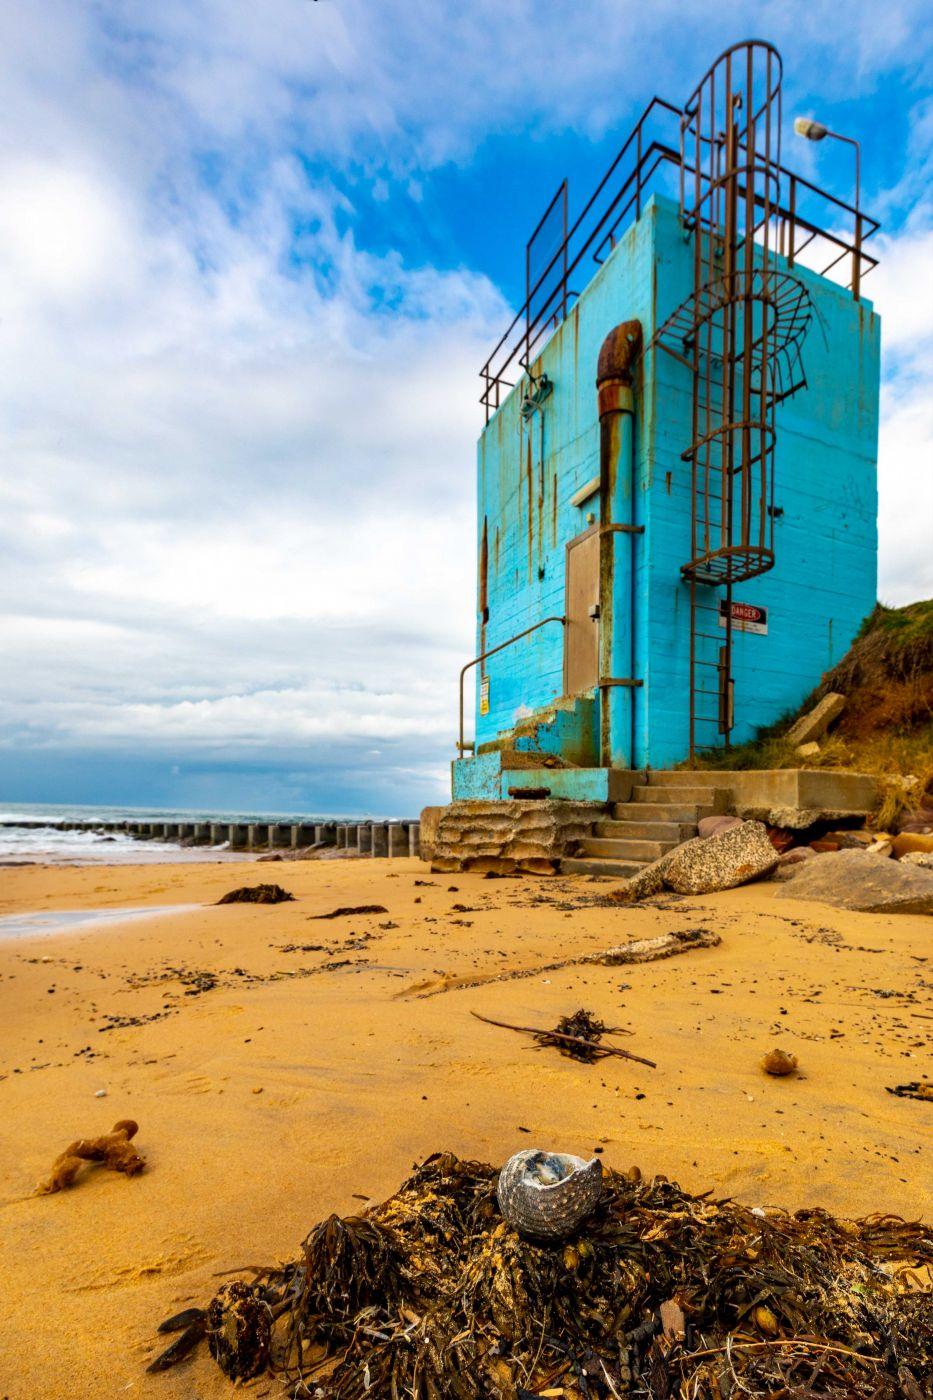 Water Tank & Shell Thirroul South Coast New Sout Wales, Australia